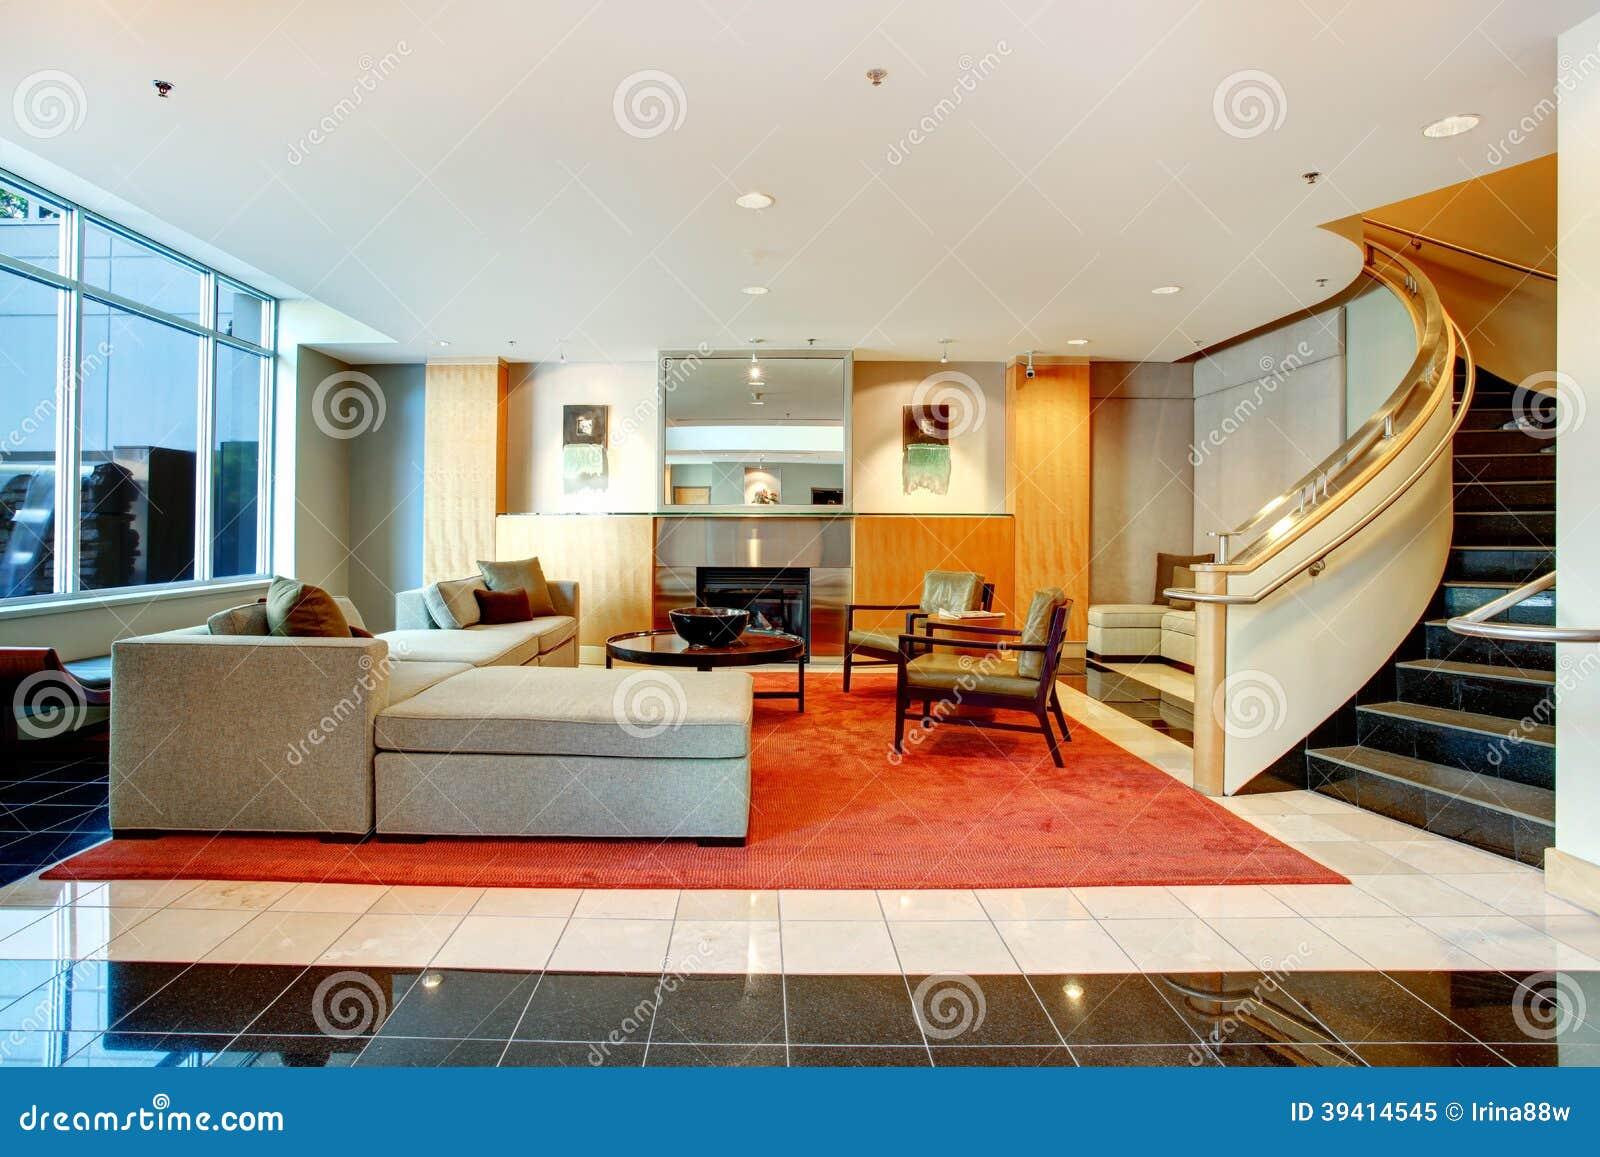 apartment building main lobby. Black Bedroom Furniture Sets. Home Design Ideas